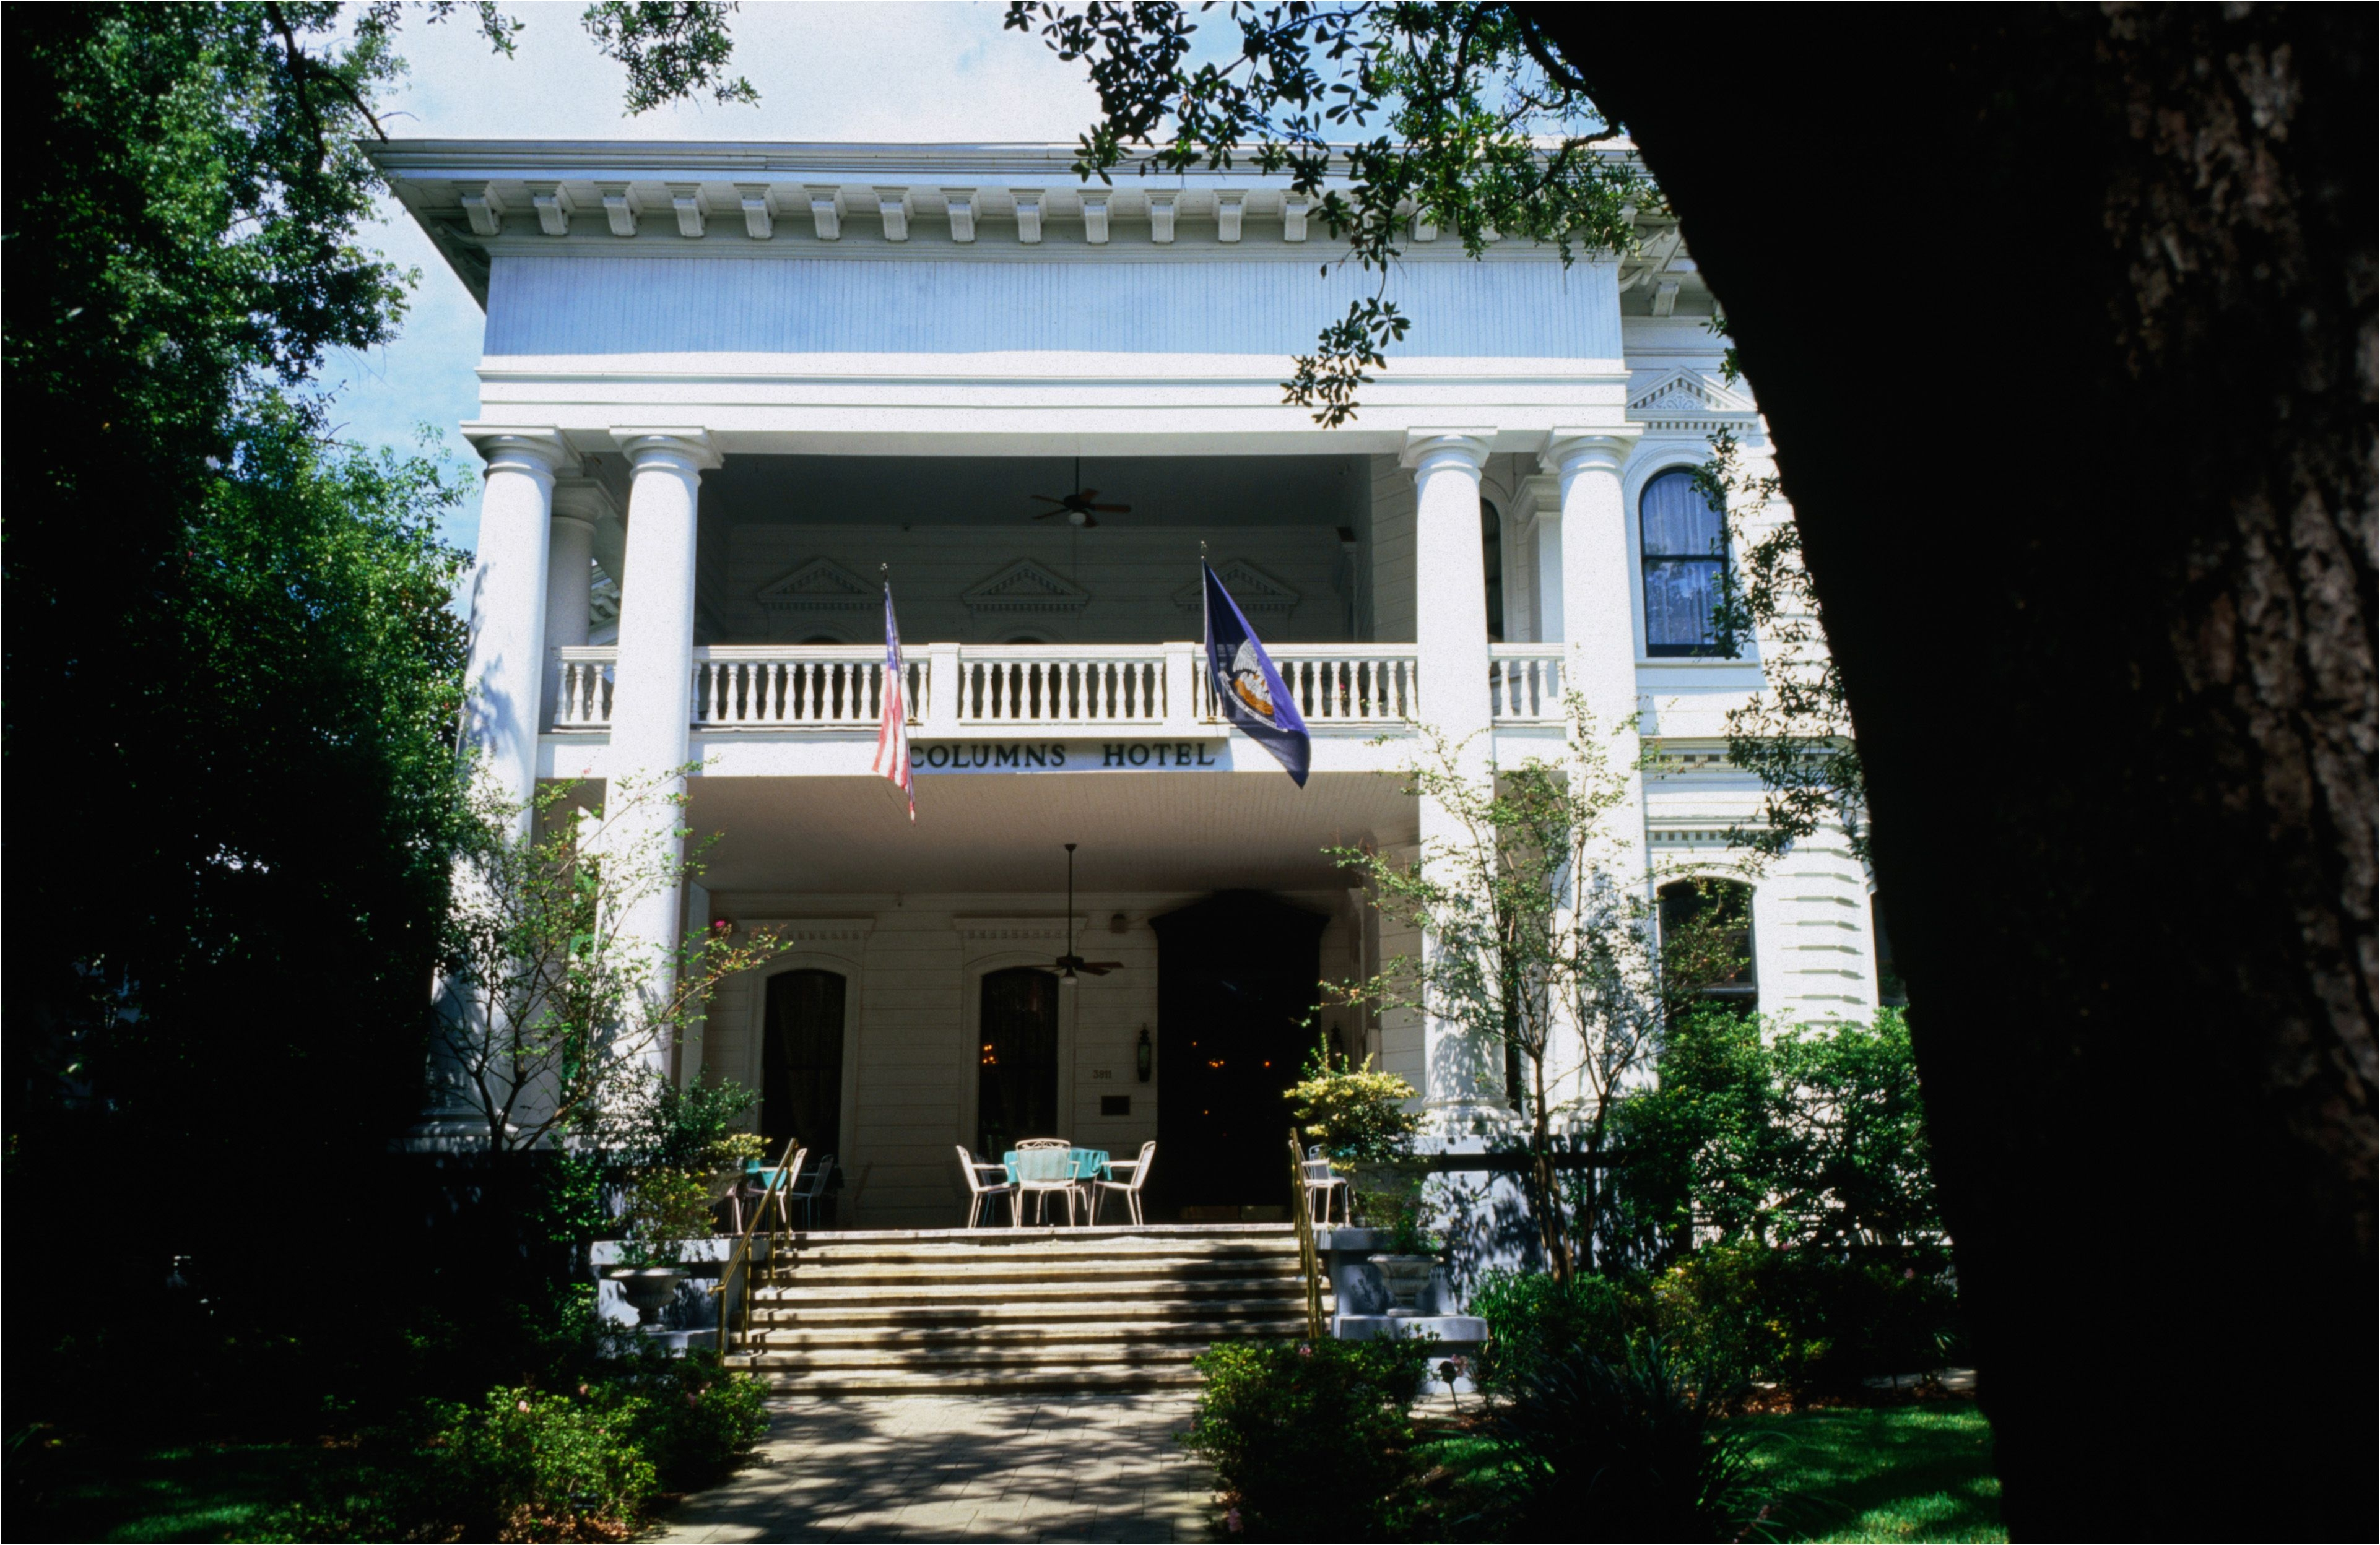 columns hotel in new orleans 150353892 5ac250ecc5542e0037963f40